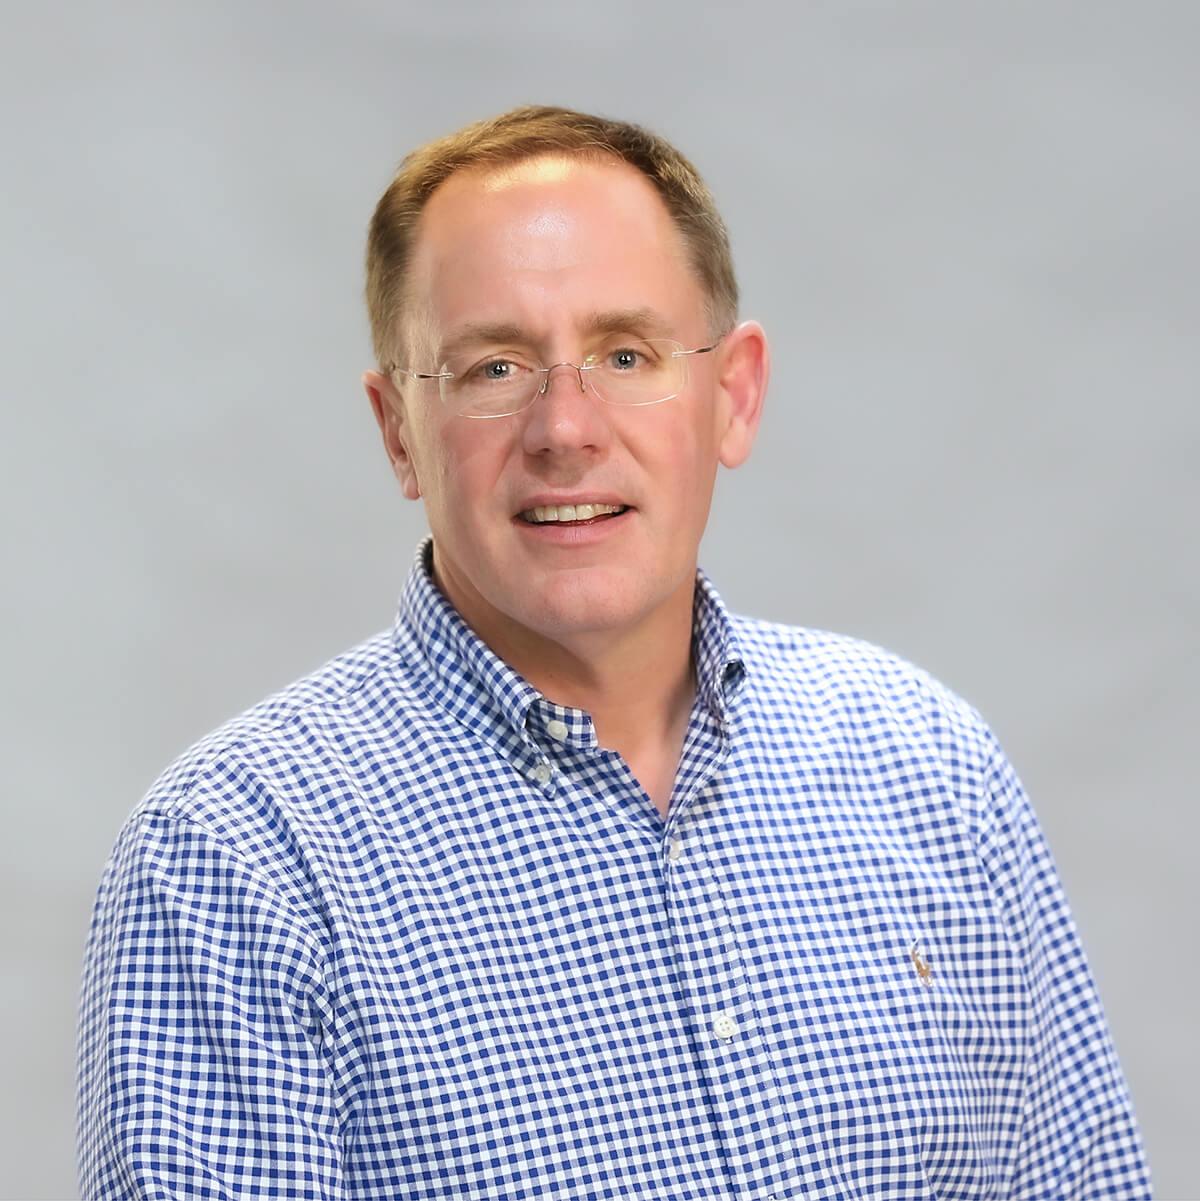 Steve Jankins